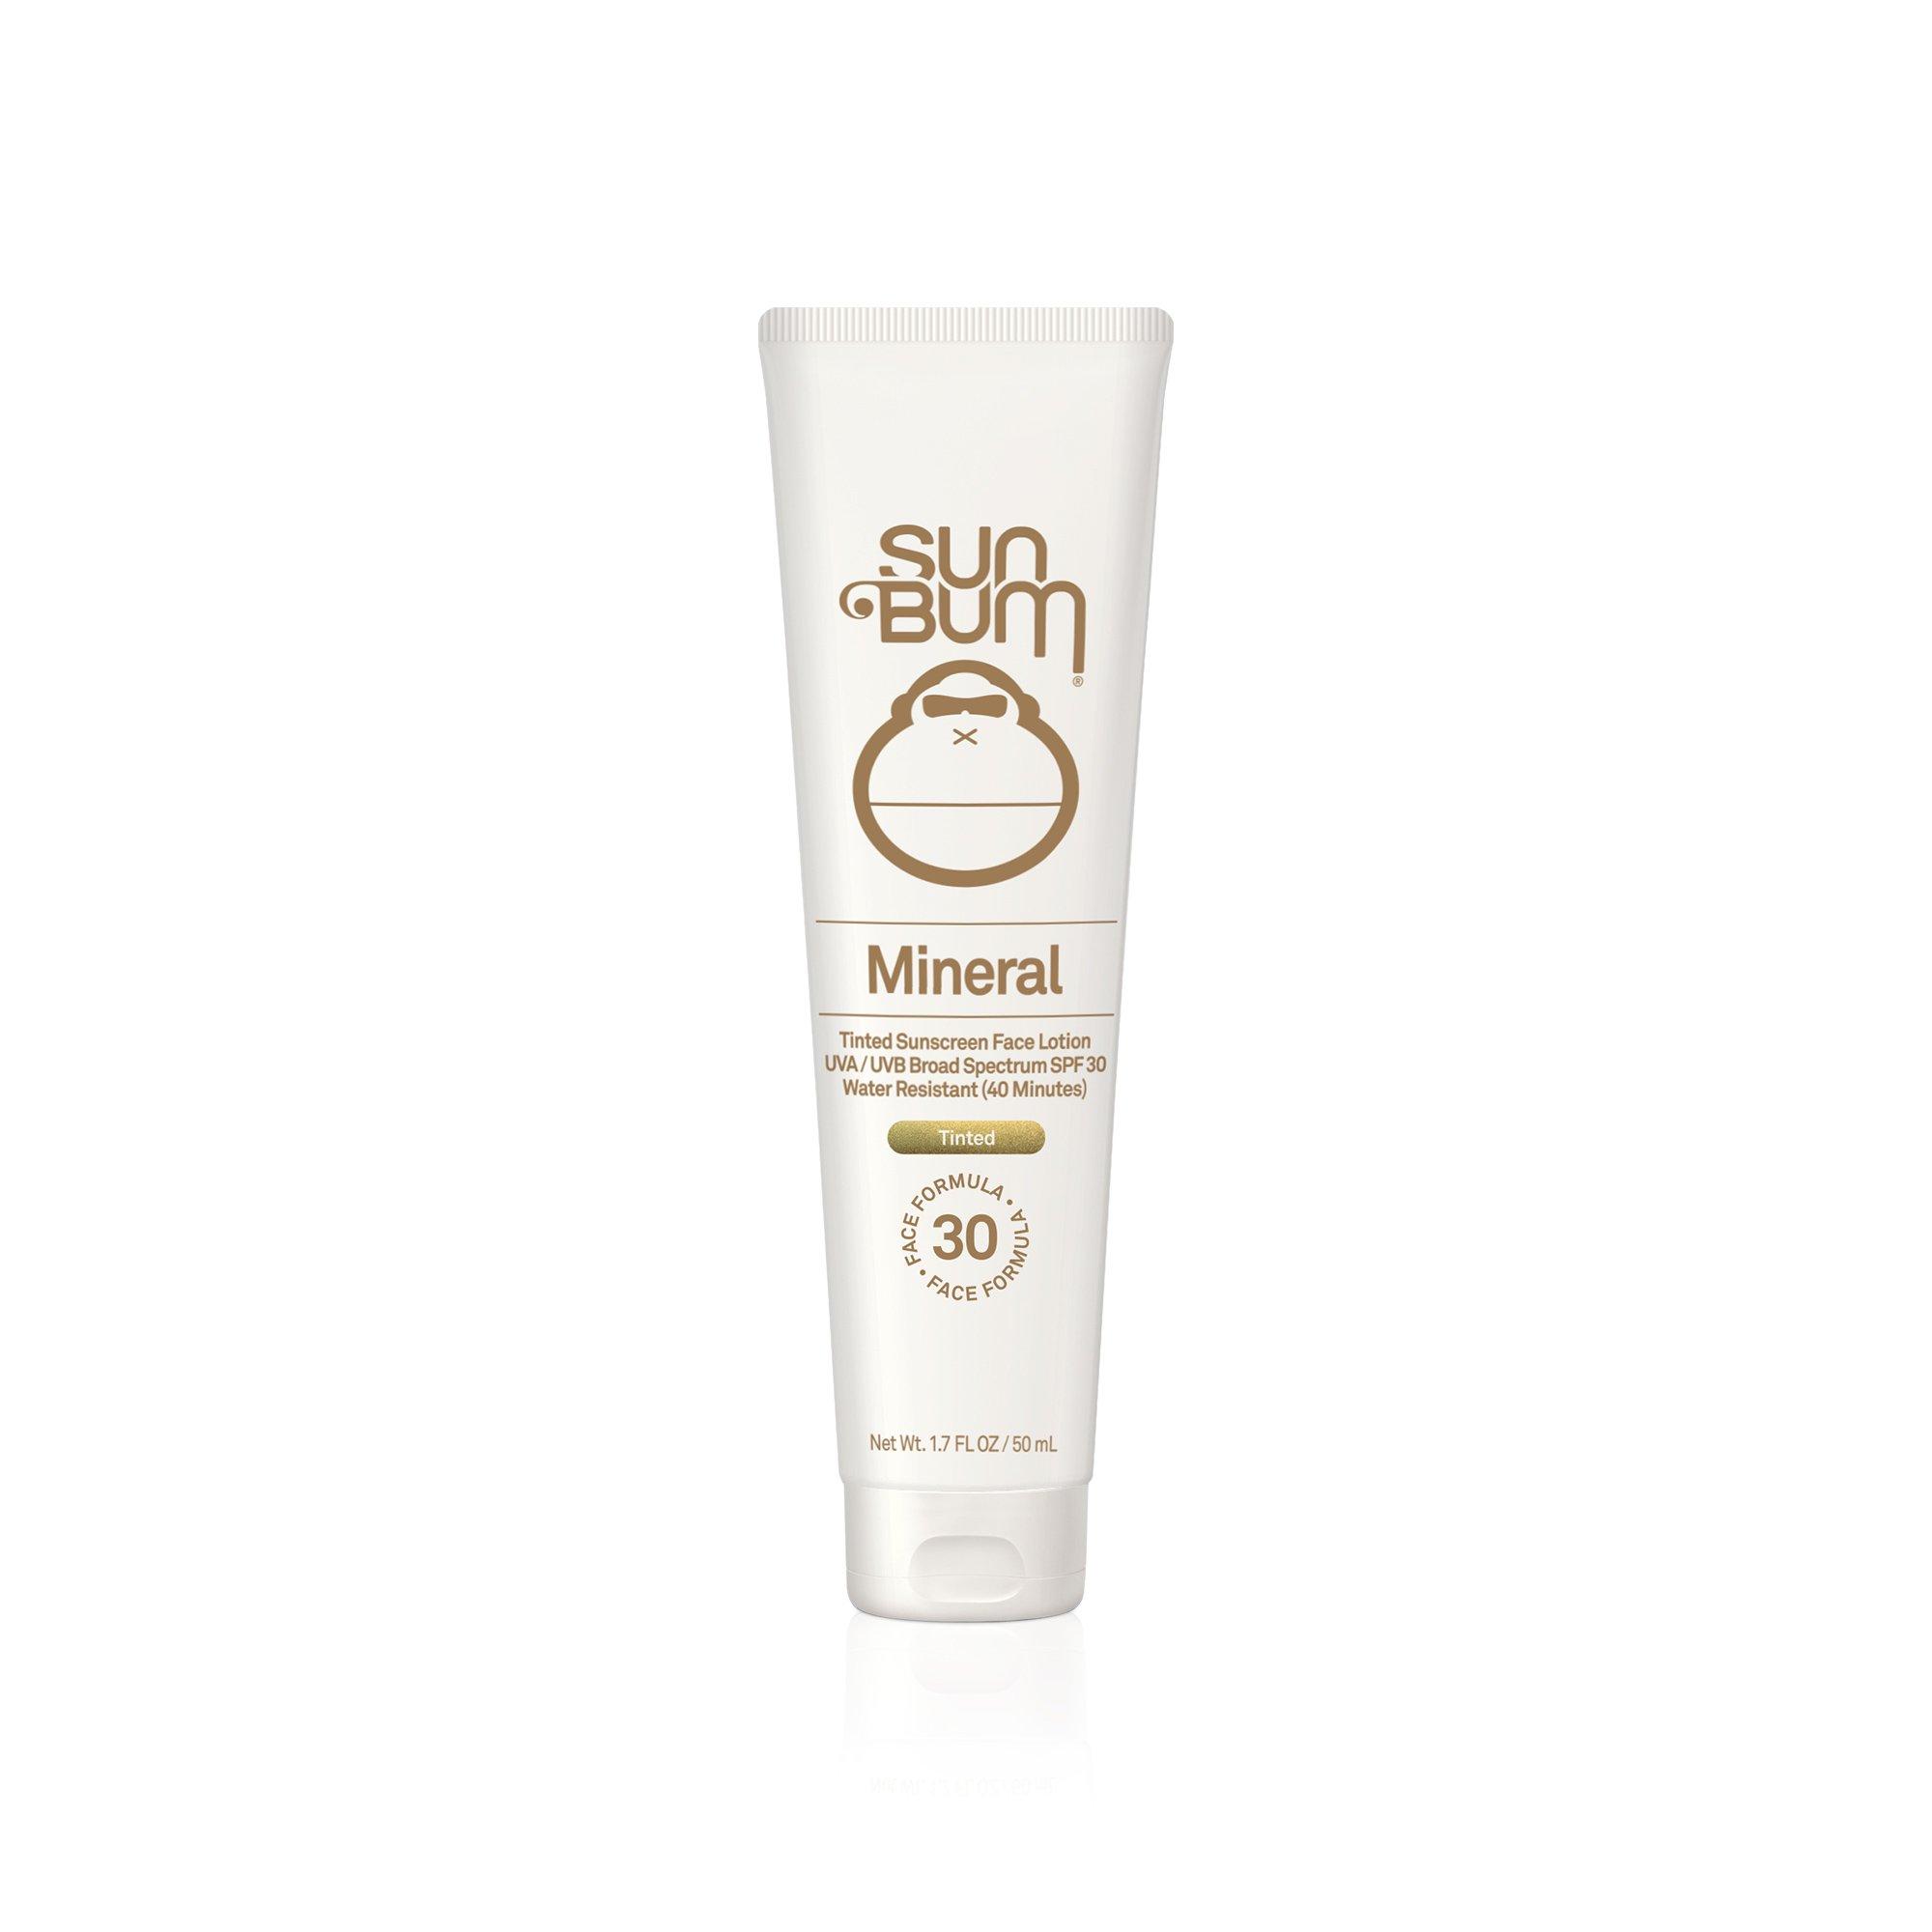 Sun Bum Mineral Sunscreen Tinted Face Lotion SPF 30 | Reef Friendly Broad Spectrum UVA/UVB Protection | Natural Zinc Sun Block|  Hypoallergenic, Paraben Free, Gluten Free, Vegan | 1.7 OZ Bottle by Sun Bum